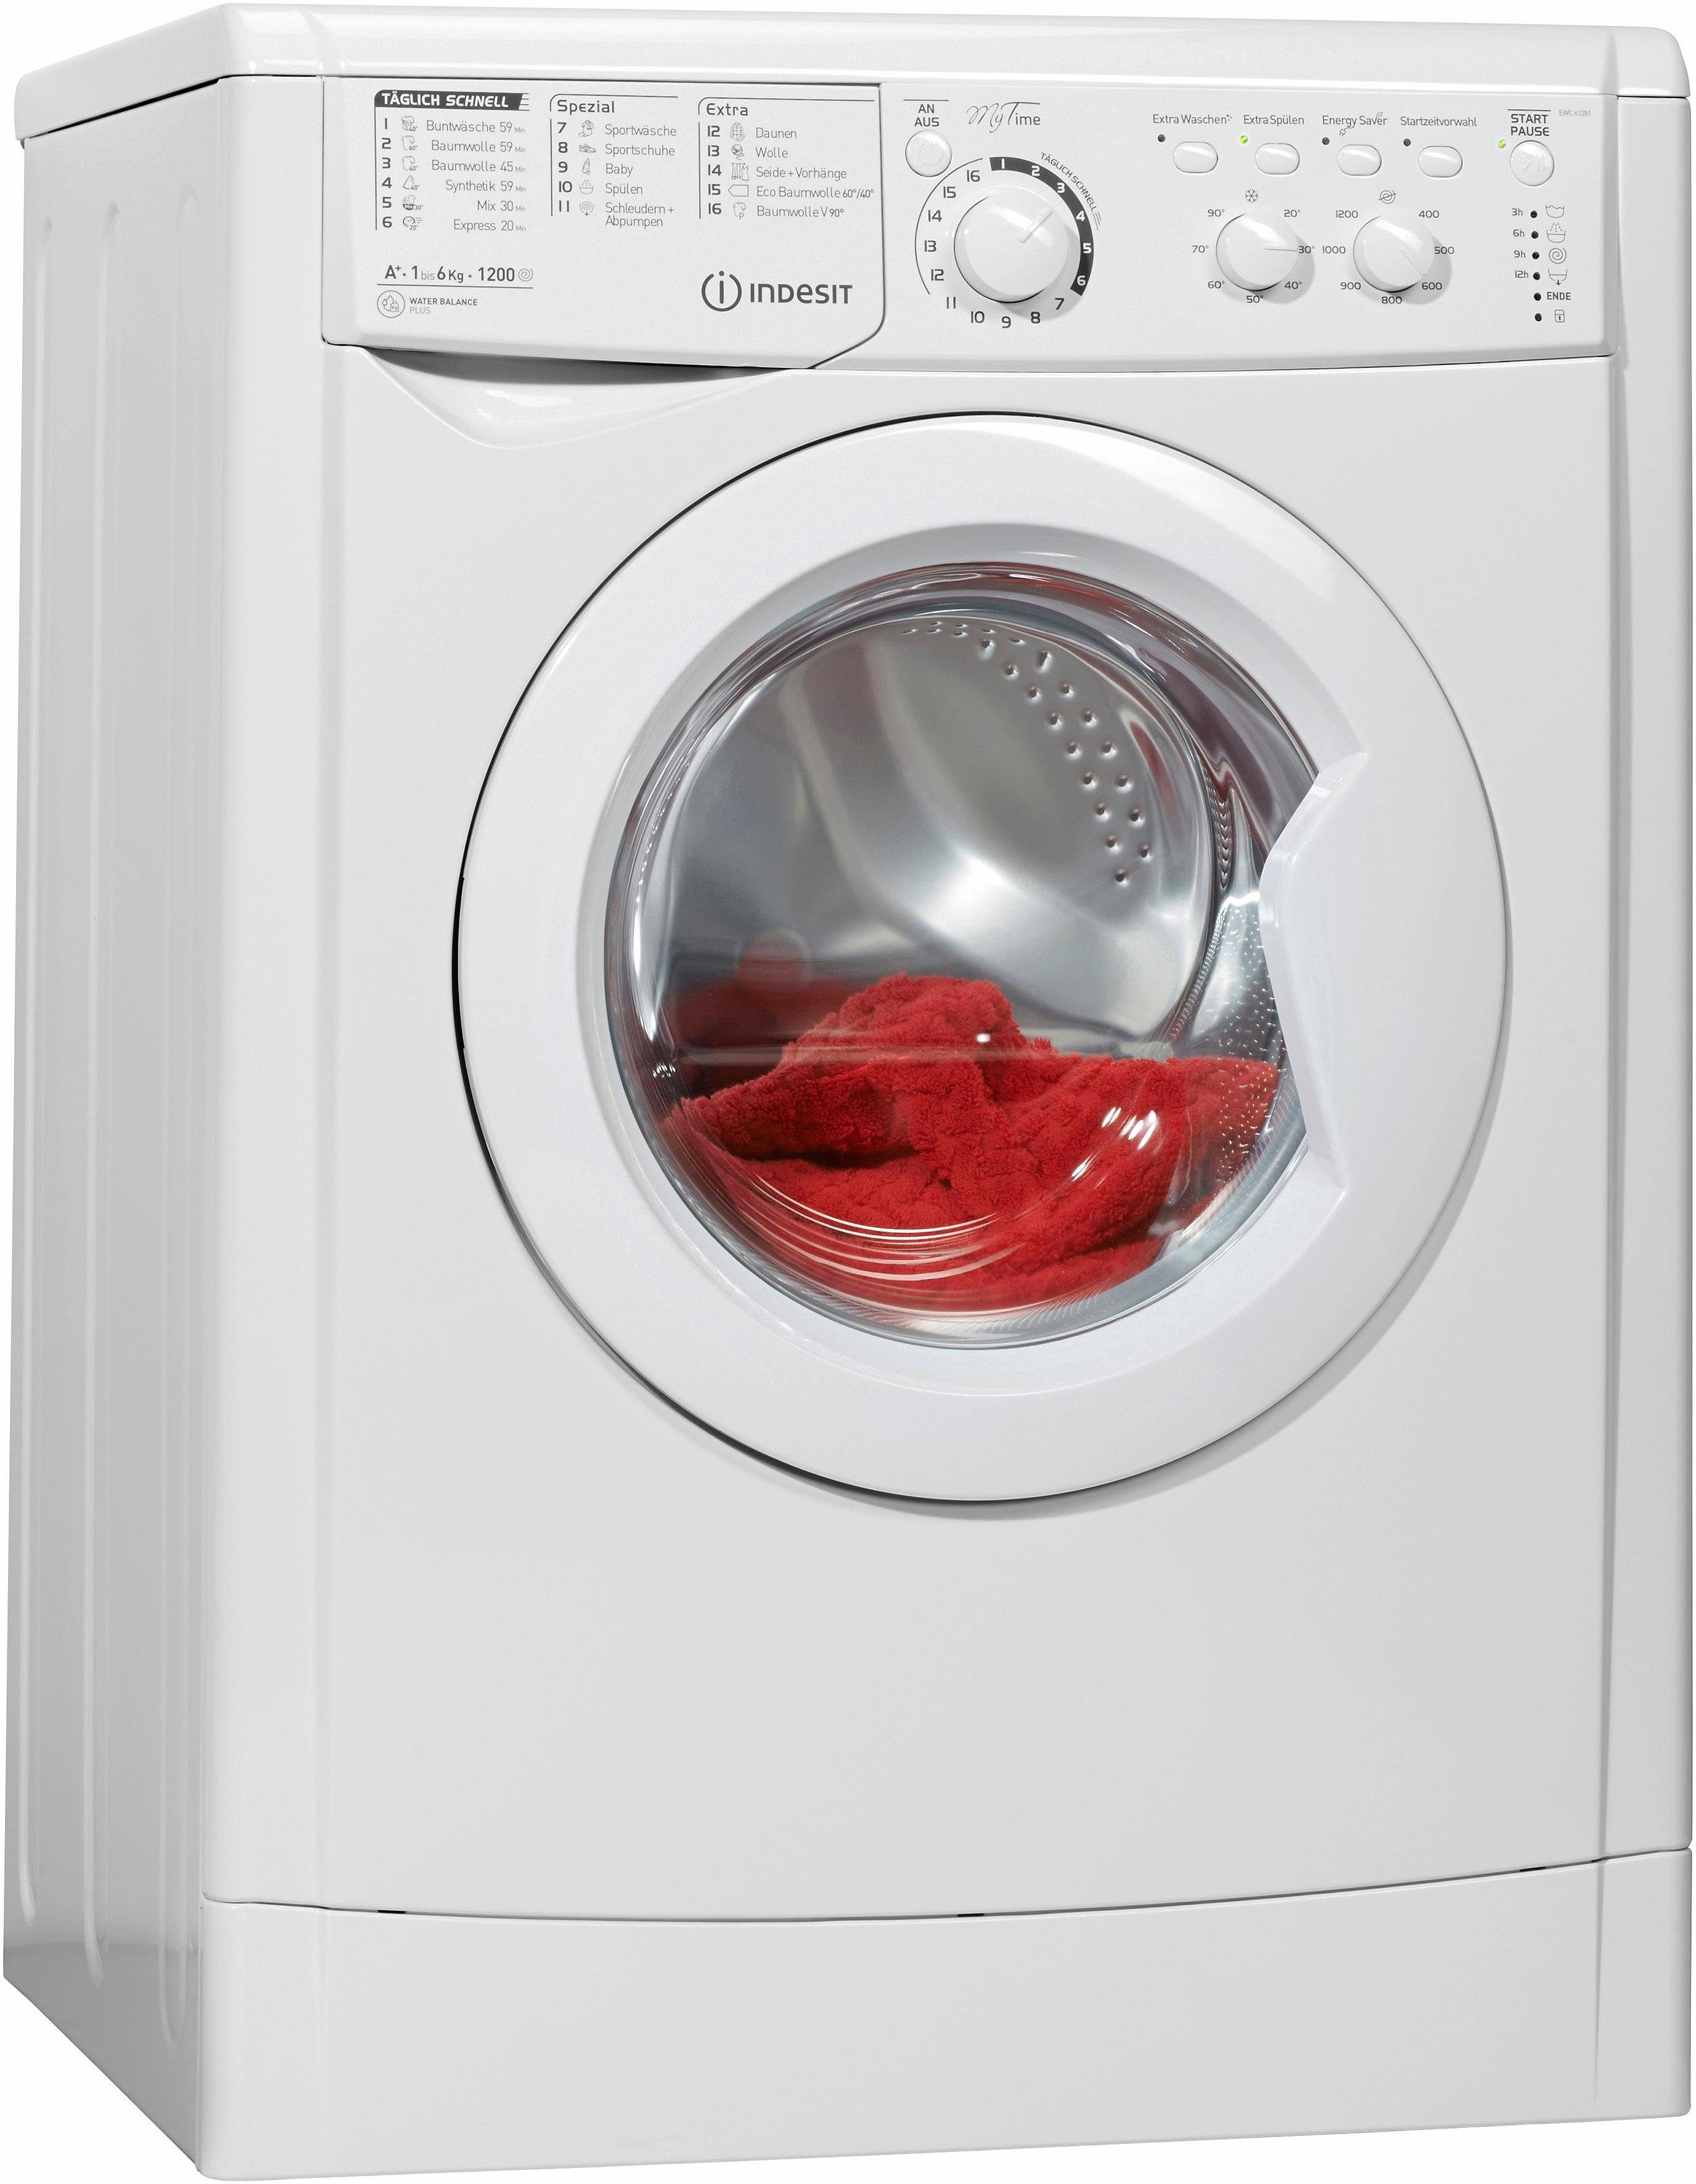 Indesit Waschmaschine EWC 61281 W DE, A+, 6 kg, 1200 U/Min